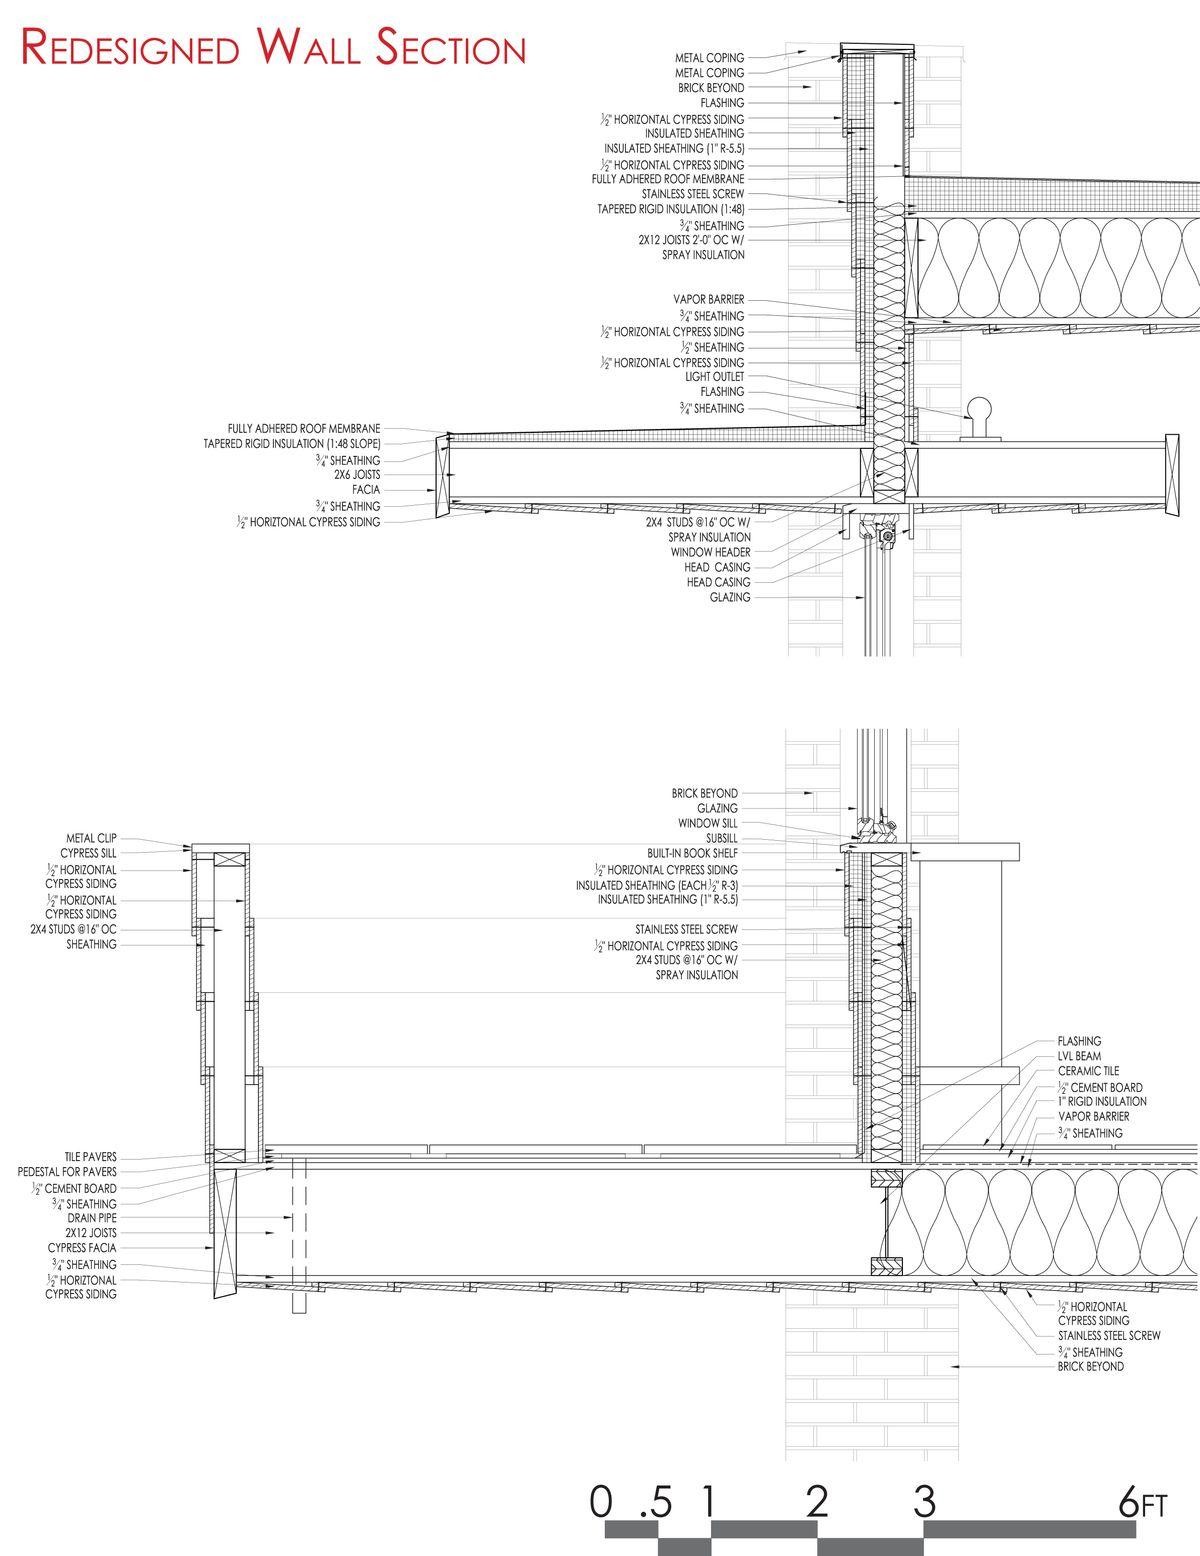 Design Of Details Frank Lloyd Wright S Affleck House Sara Horn Archinect Frank Lloyd Wright Lloyd Wright Wright